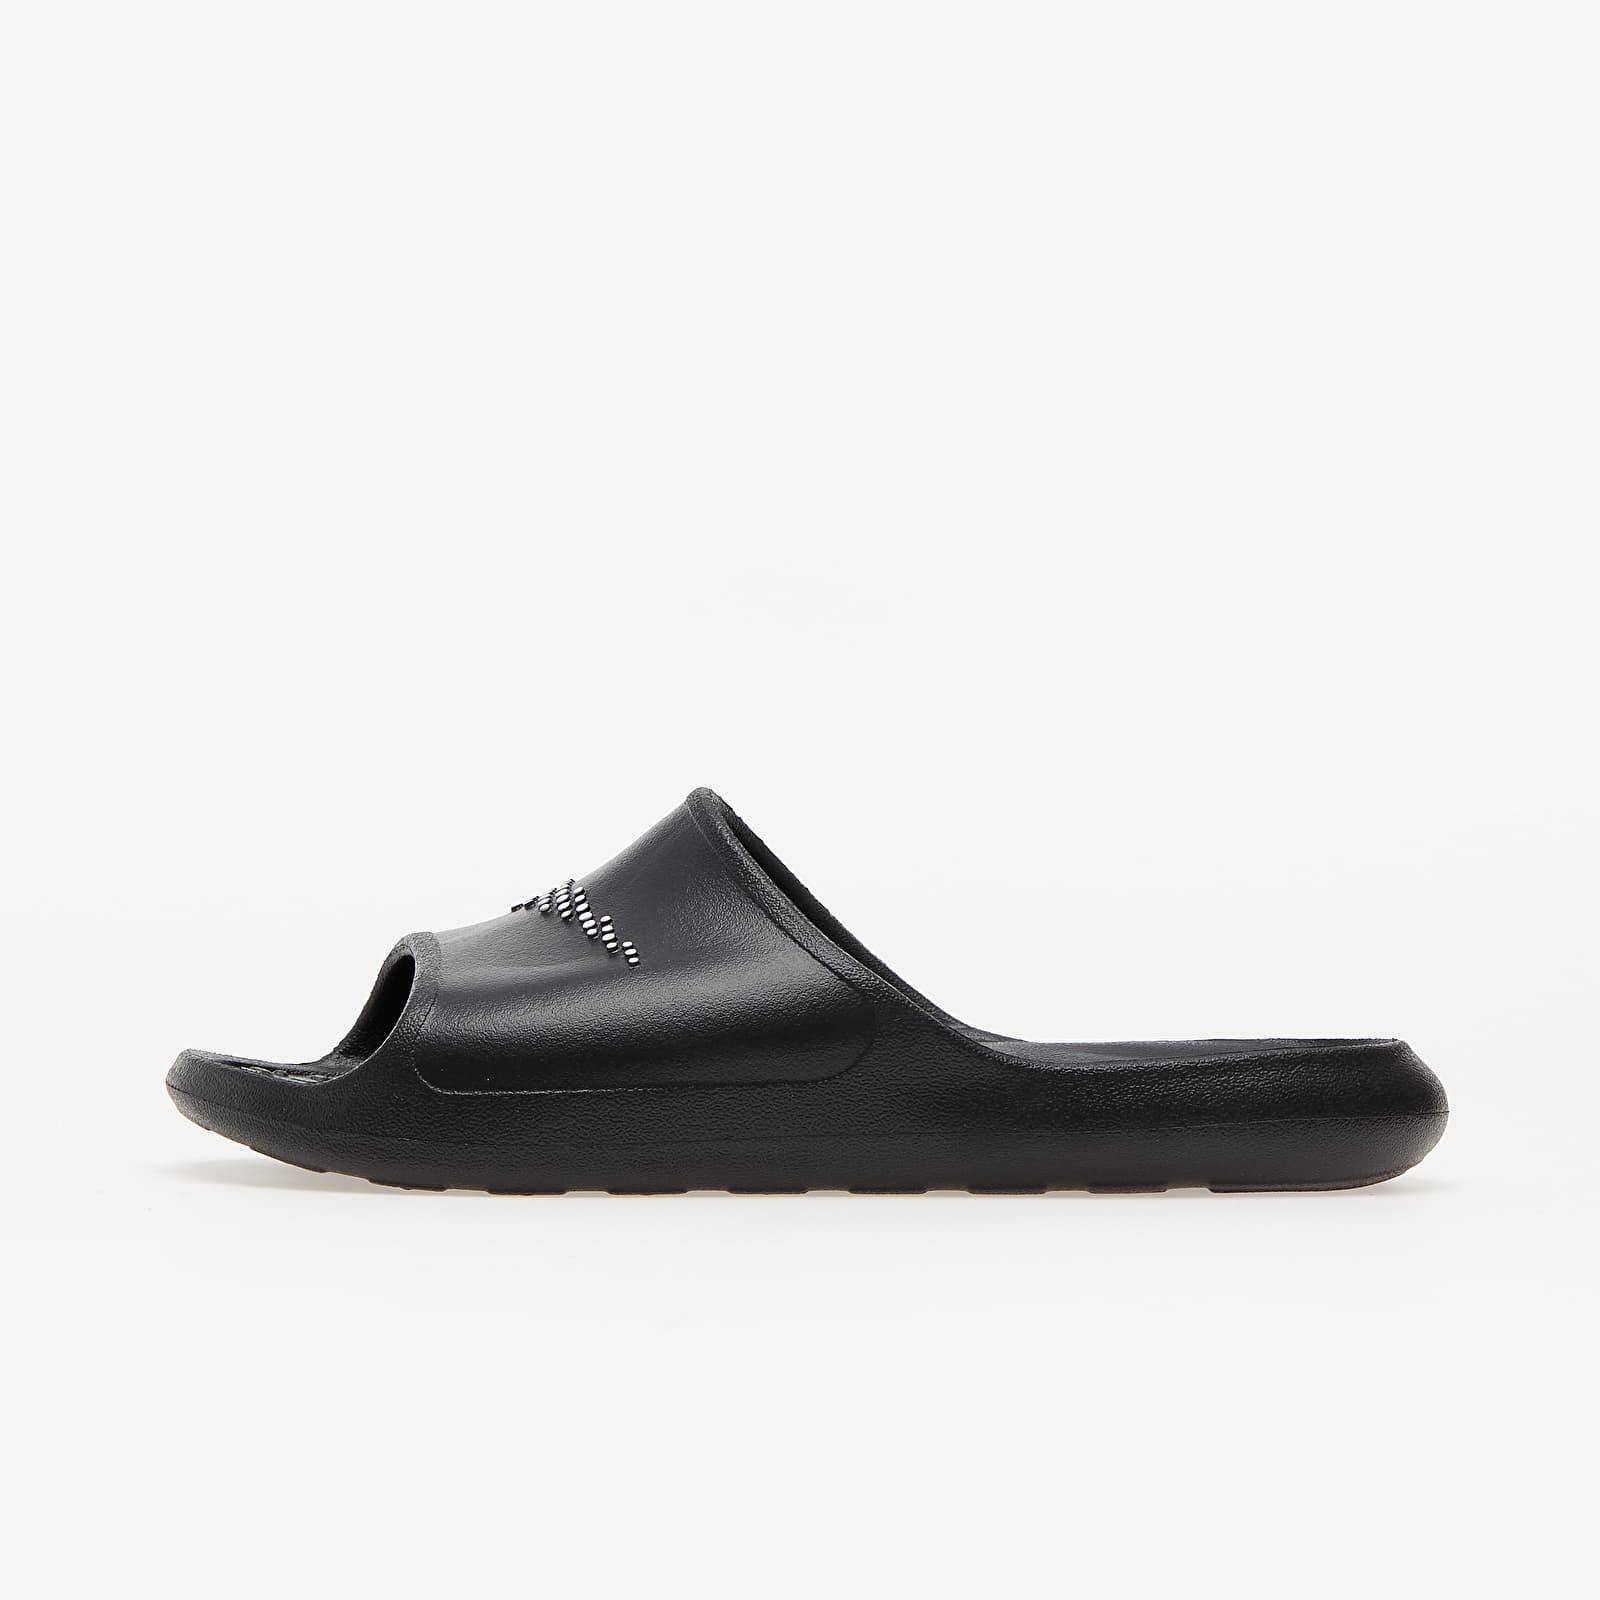 Nike W Victori One Shower Slide Black/ White-Black EUR 40.5